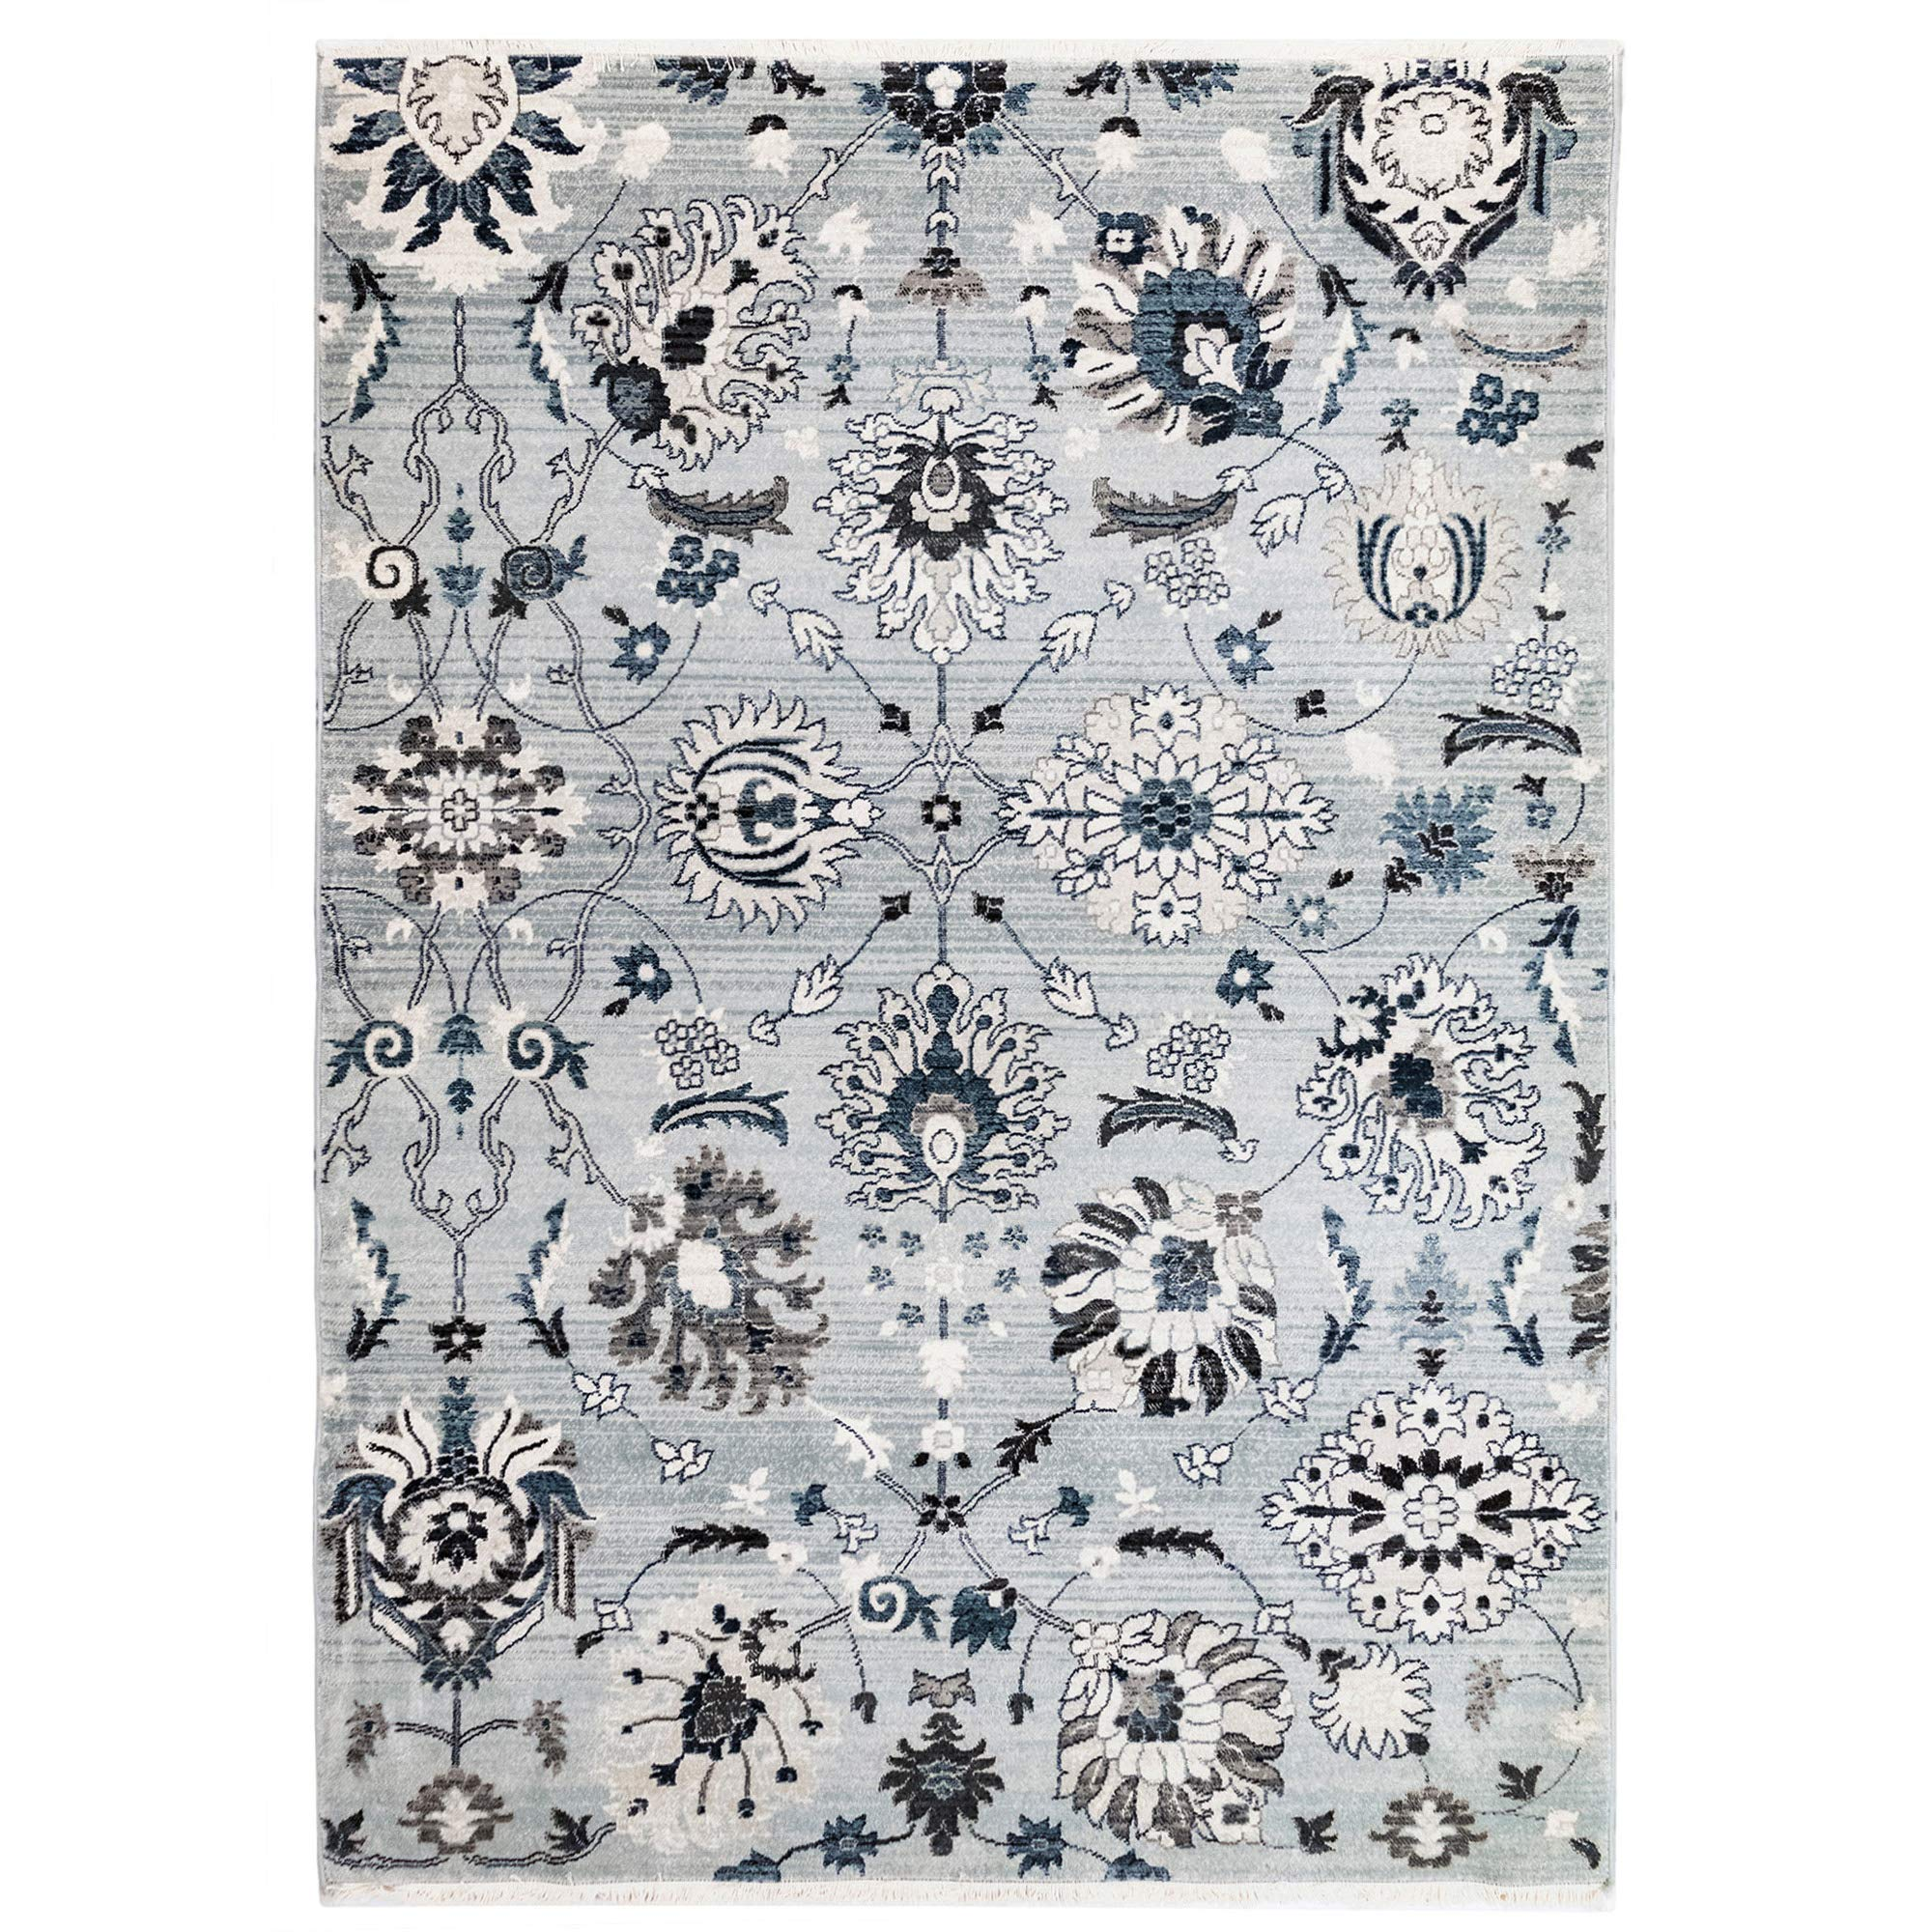 M by Liora MQU91816203 Marquee Vintage Tabriz Botanical Indoor Rug 8'10'' X 11'9'' Pale Blue and Navy